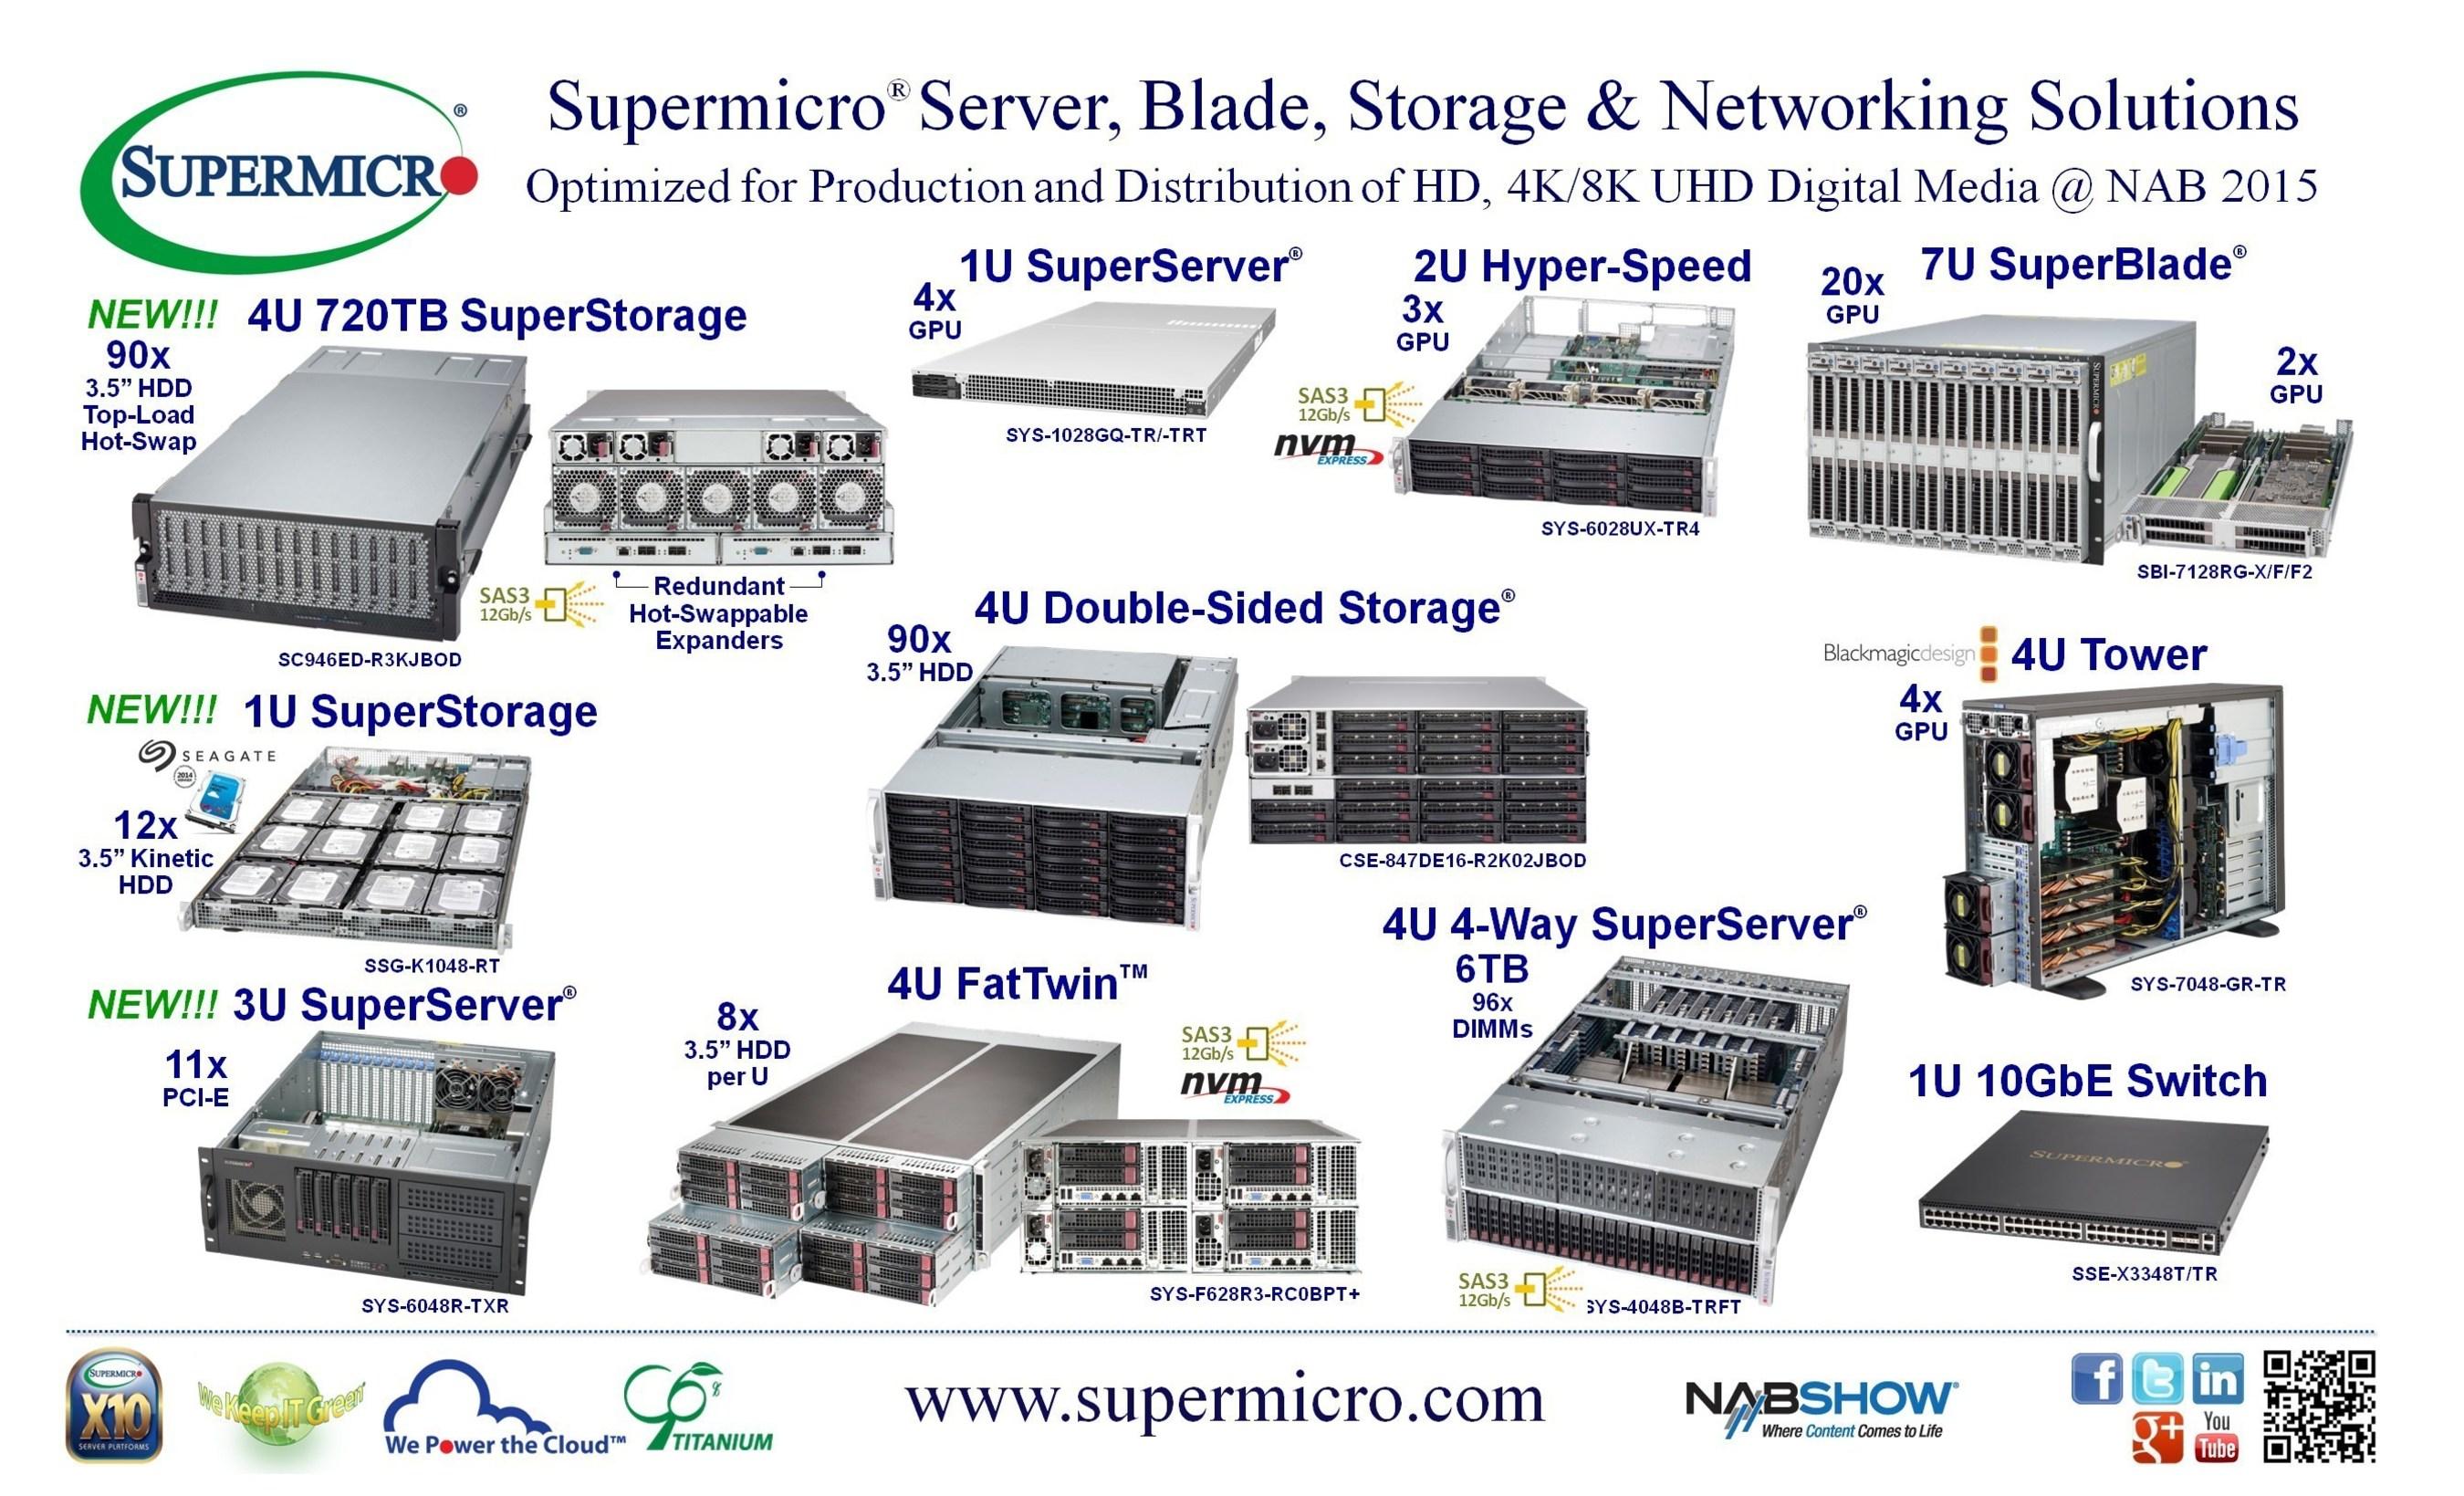 Supermicro® Debuts New 720TB 4U 90x 3 5